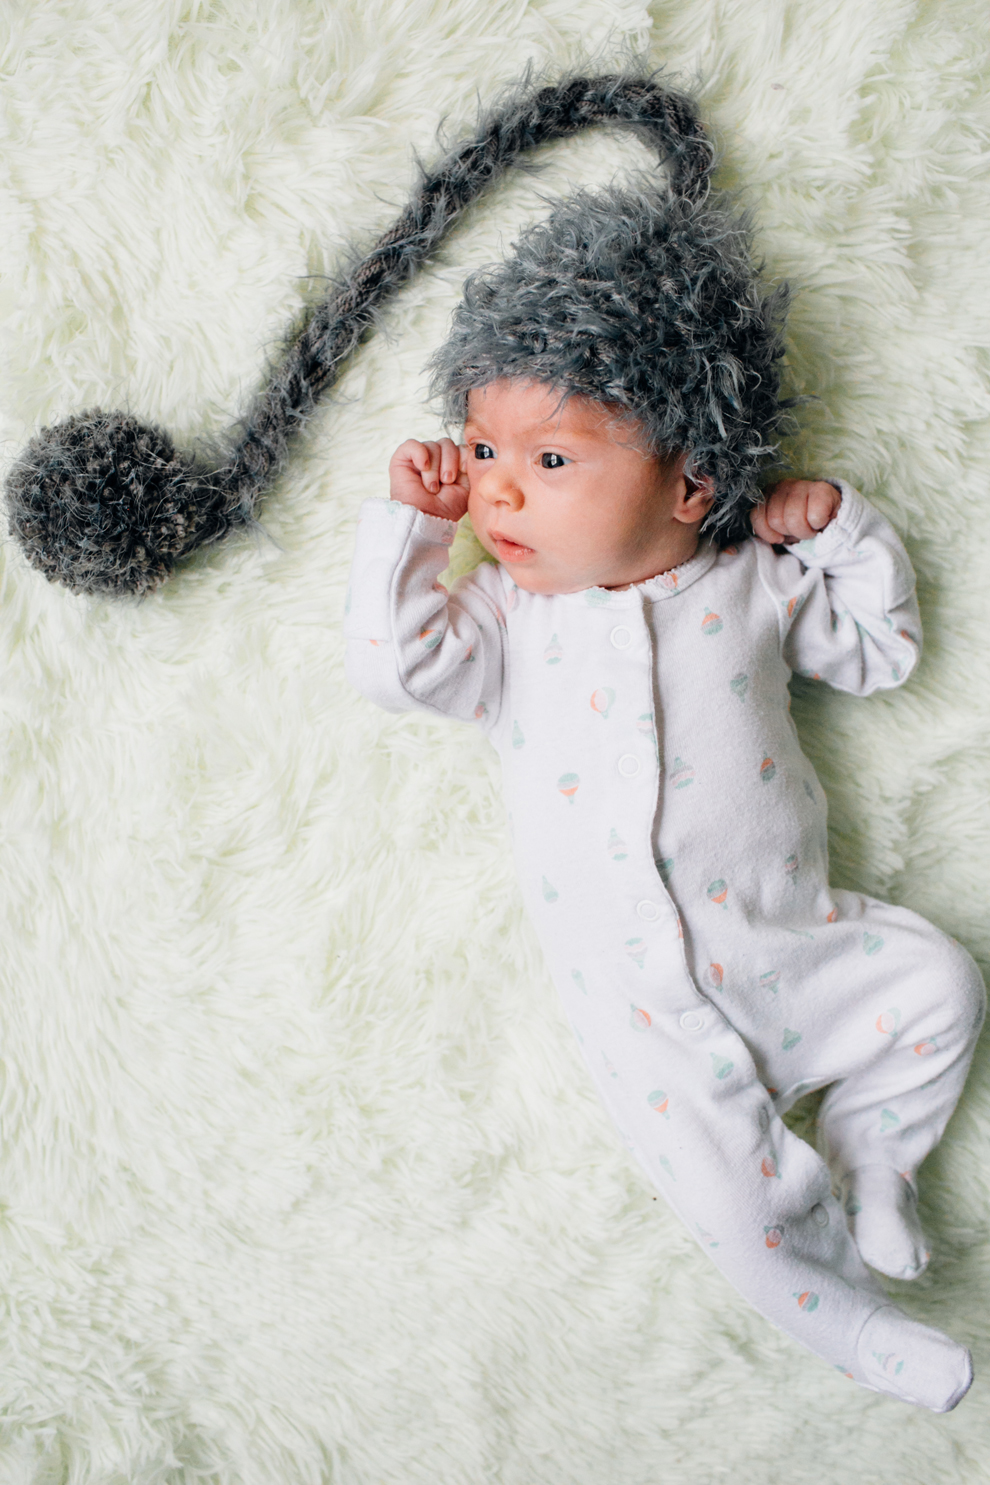 010-bellingham-newborn-photographer-photo-nursery-harper-lifestyle-session.jpg